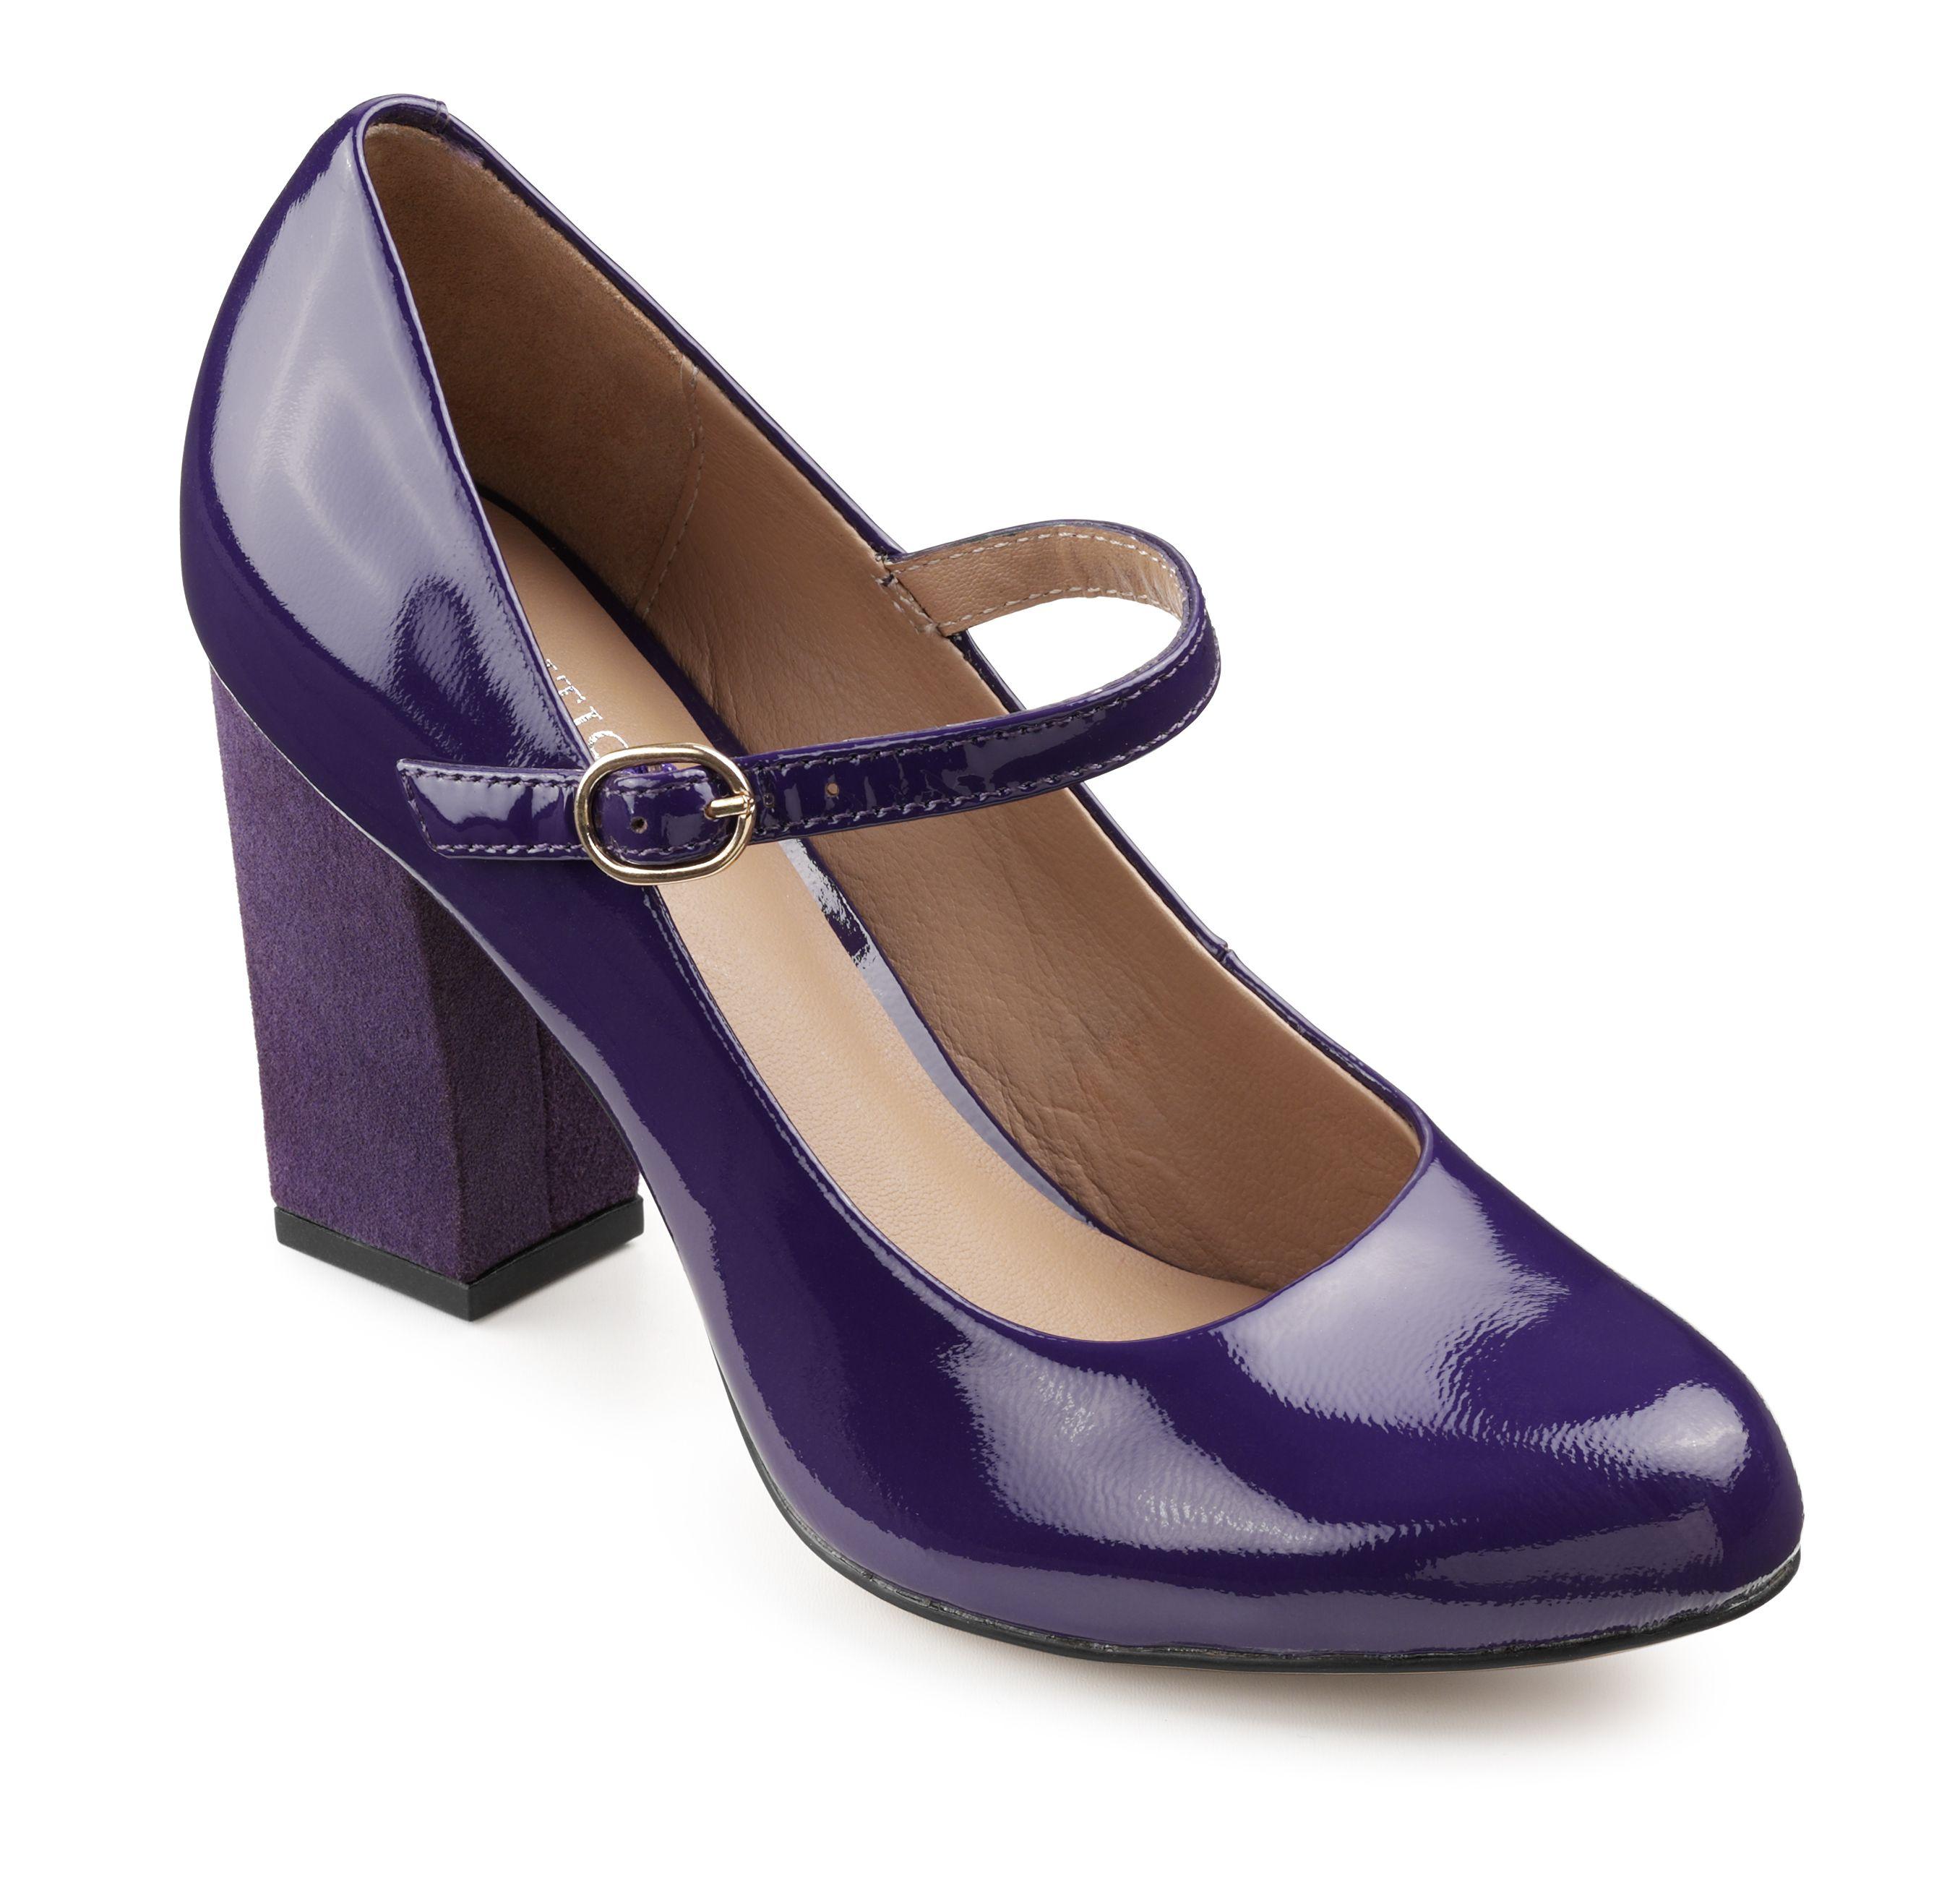 Purple dress with shoes  Fame  Dark Purple Patent  Astonishing Shoes  Pinterest  Dark